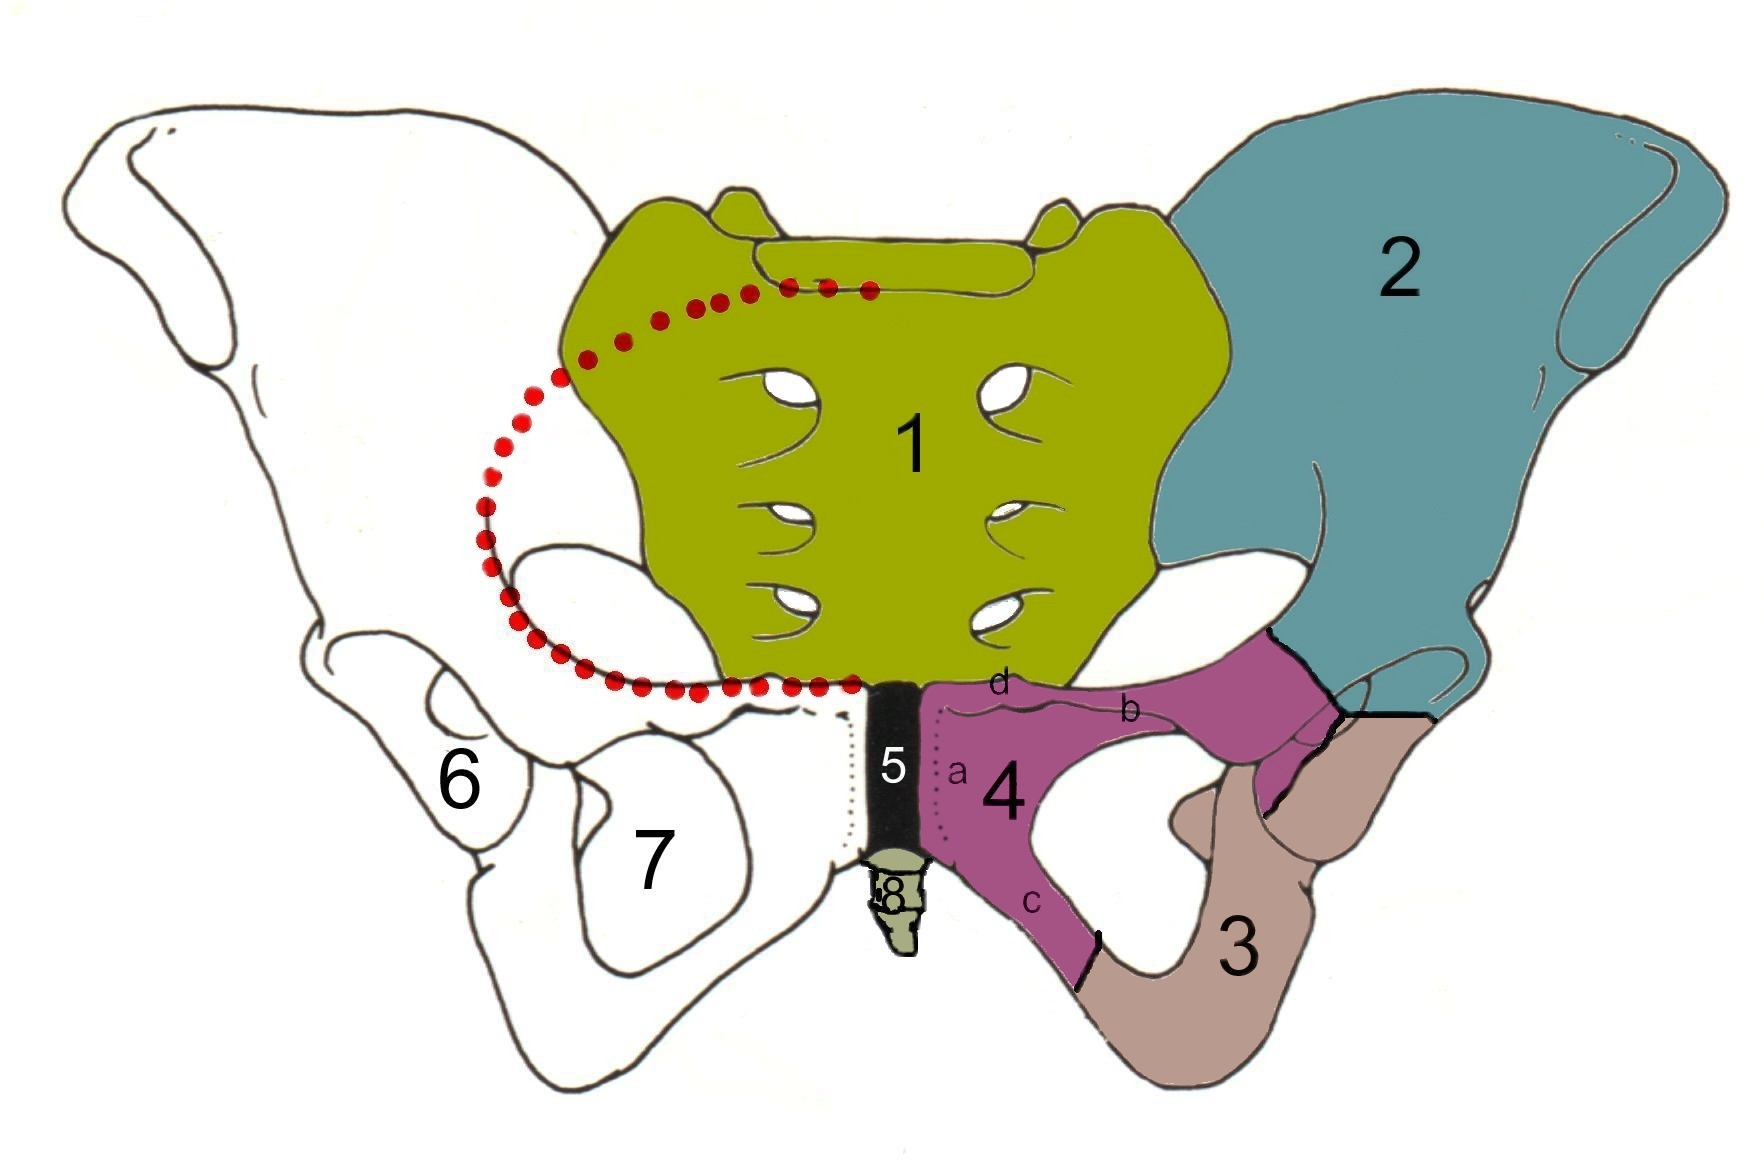 File:Skeletpelvis-pubis.jpg - Wikimedia Commons